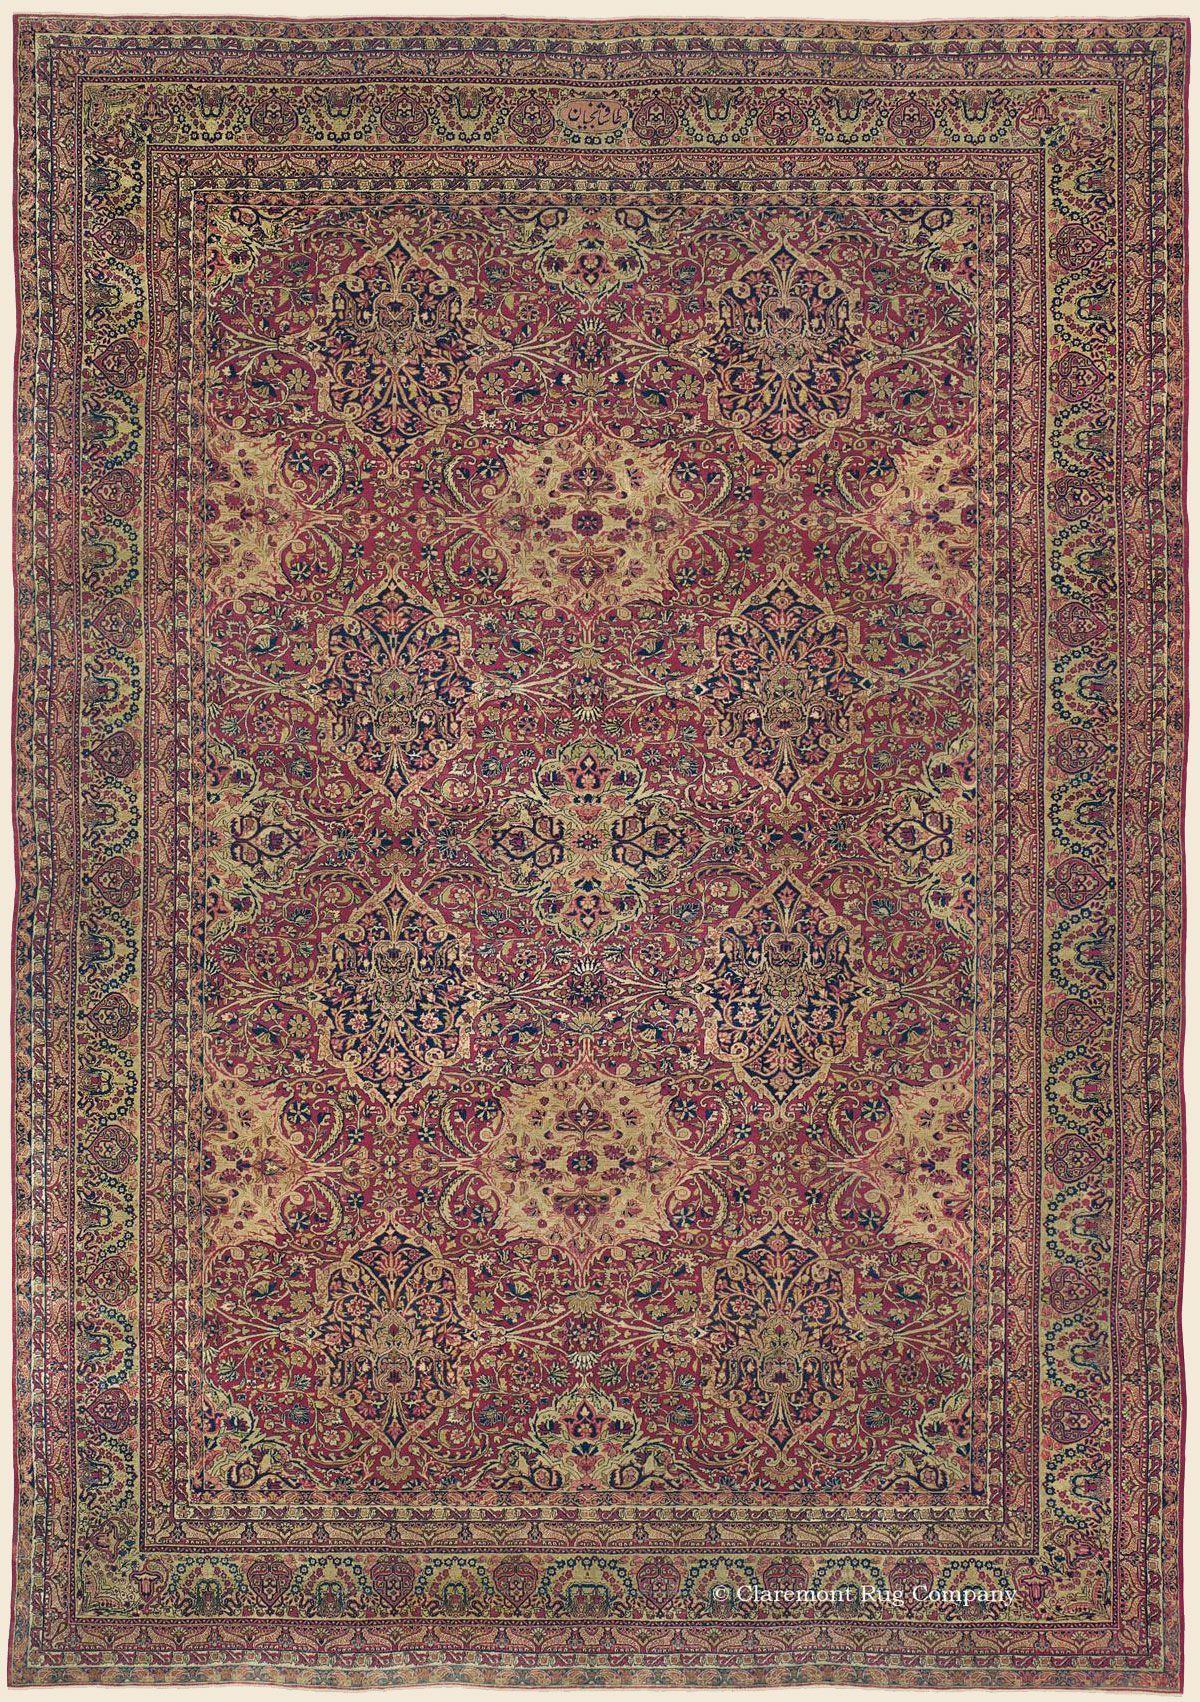 Laver Kirman Southeast Persian Antique Rug 10 8 X 15 4 Circa 1875 Claremont Rug Company Oriental Rug Rugs Rugs On Carpet